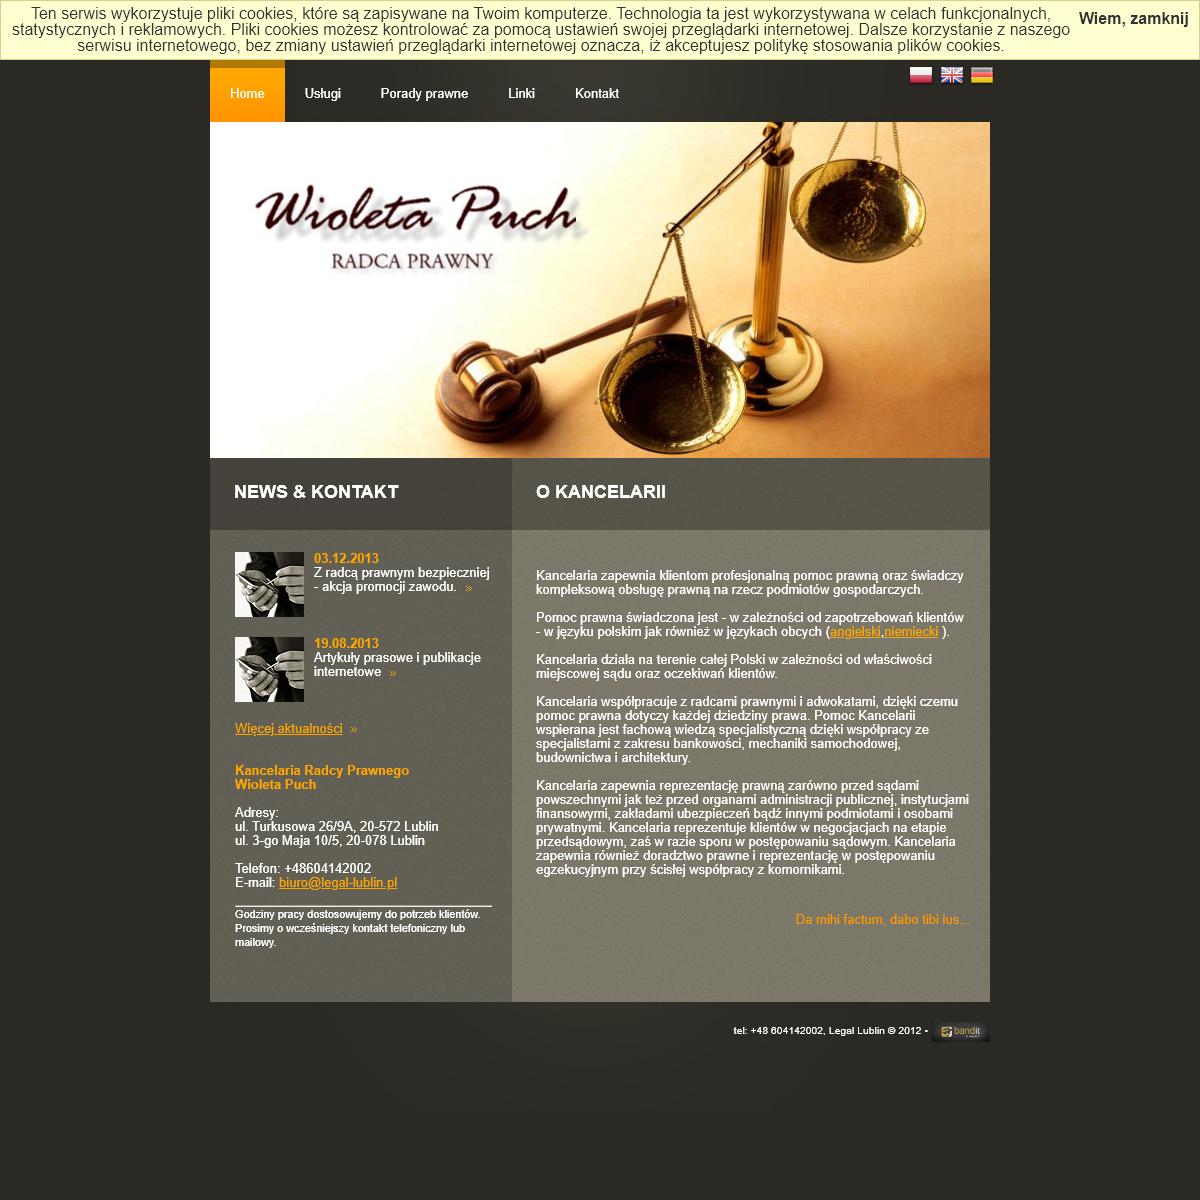 Home -- Kancelaria Radcy Prawnego Wioleta Puch